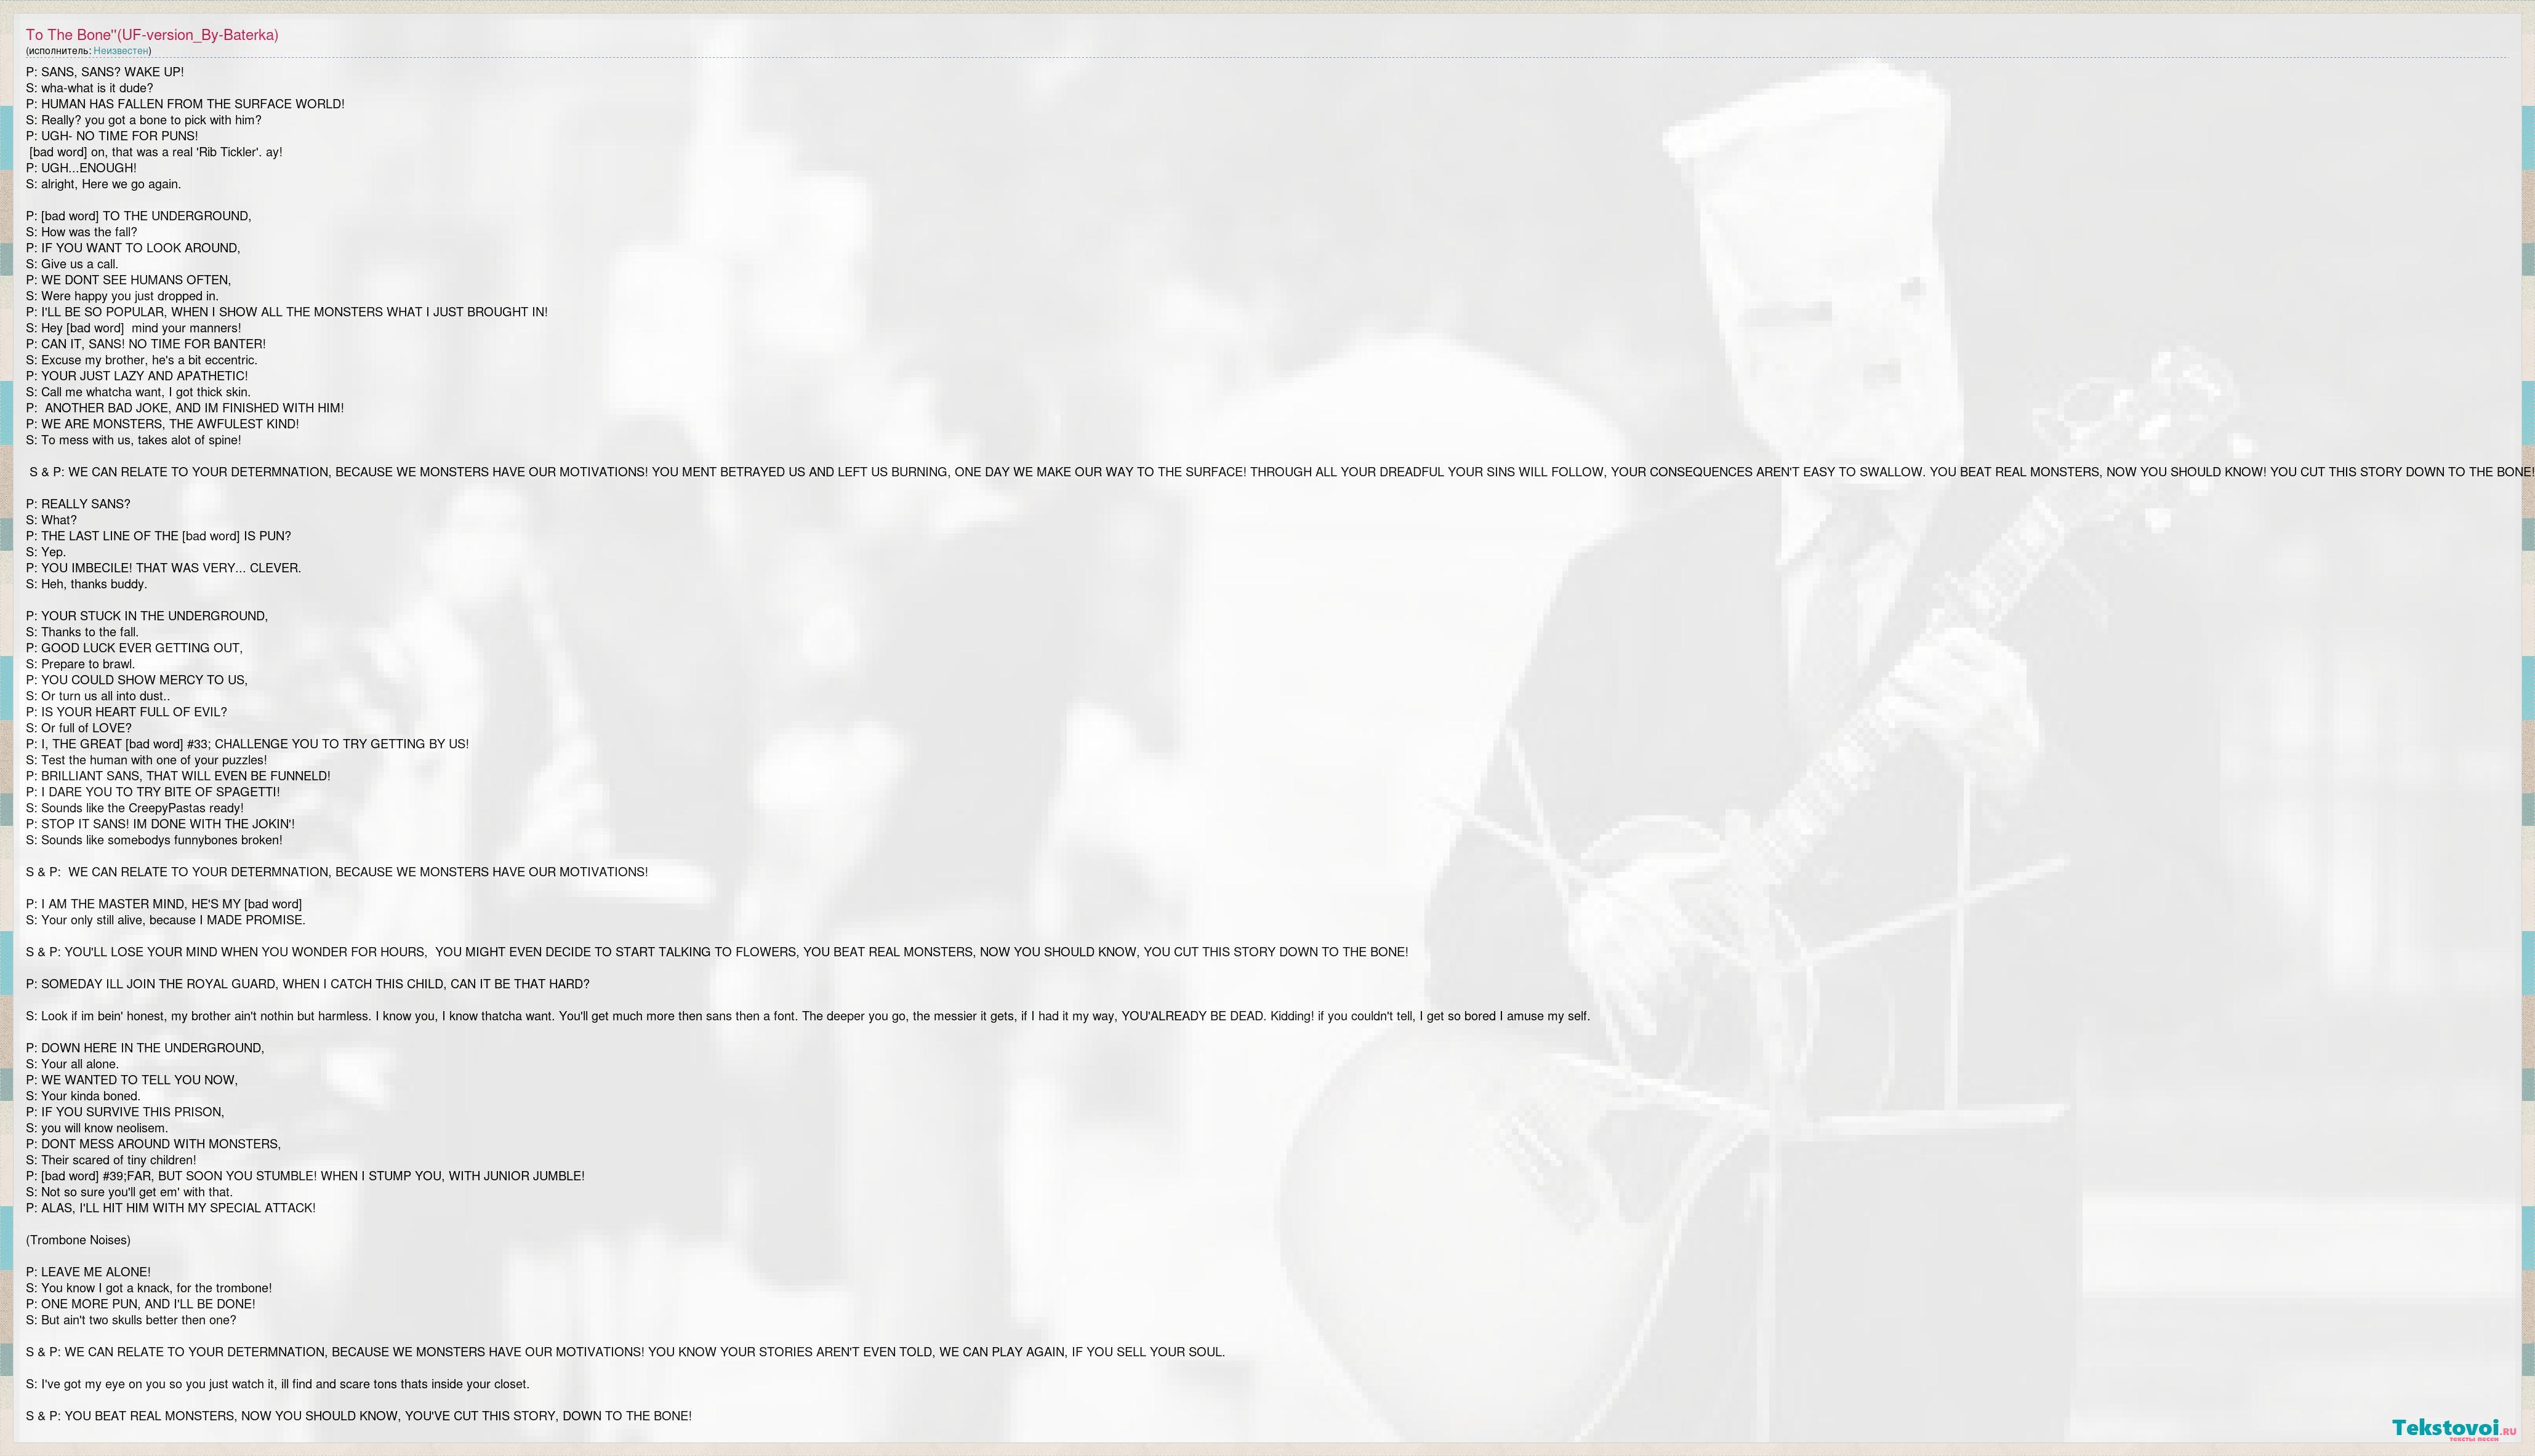 Неизвестен: To The Bone''(UF-version_By-Baterka) слова песни